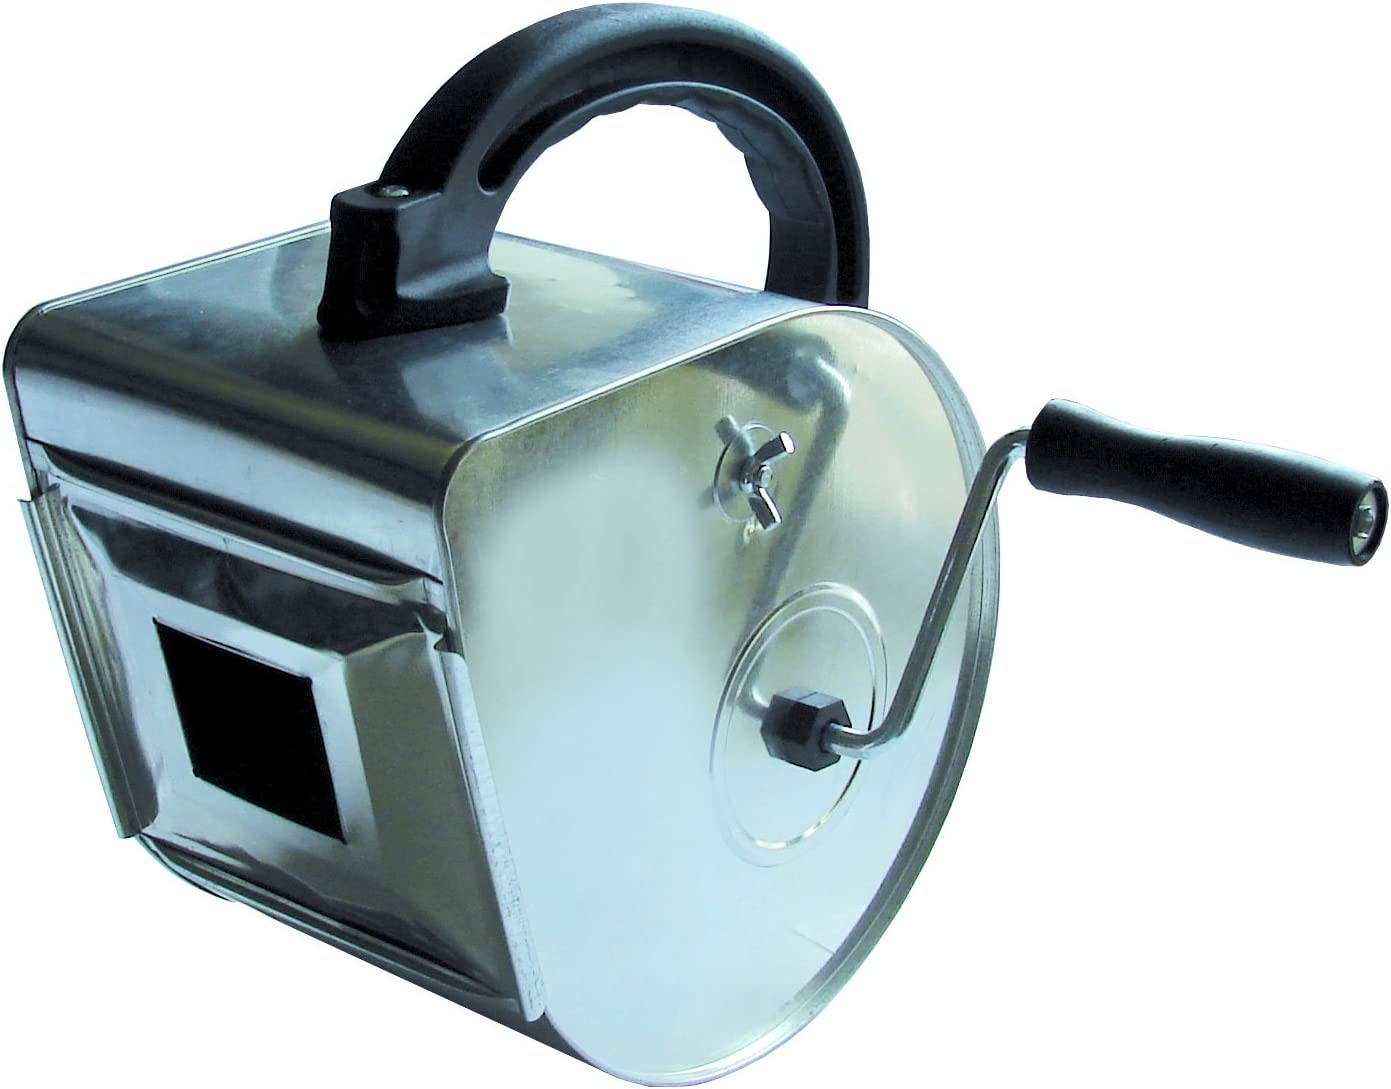 Cevik CA-TIROLESA - Herramienta Manual Maquina manual para impermeabilización, gotelé y estuco